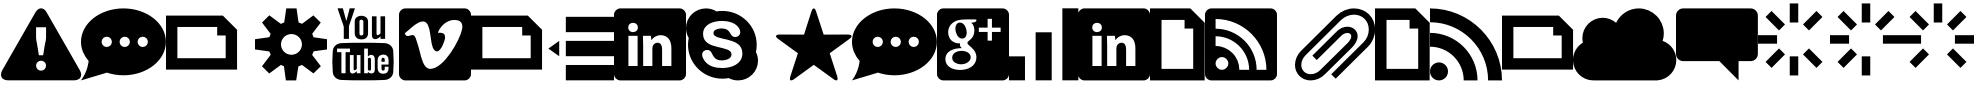 symbols x